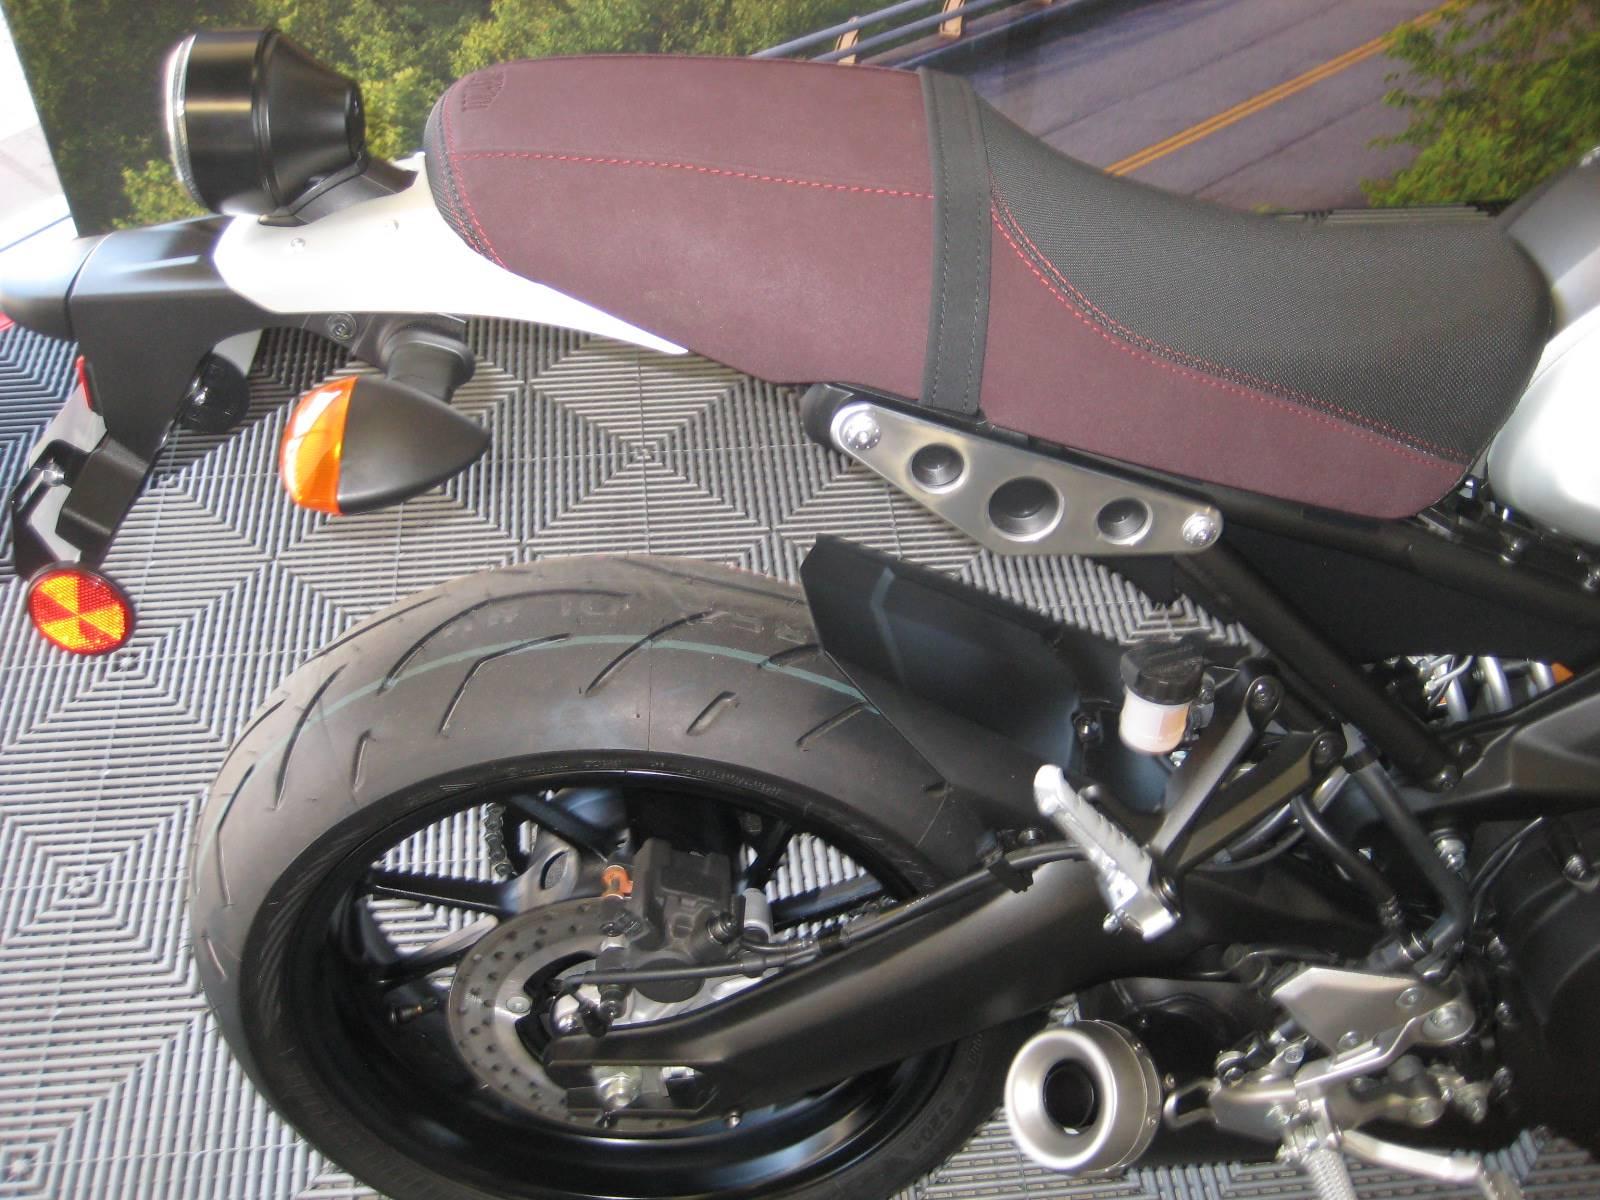 2016 Yamaha XSR900 12